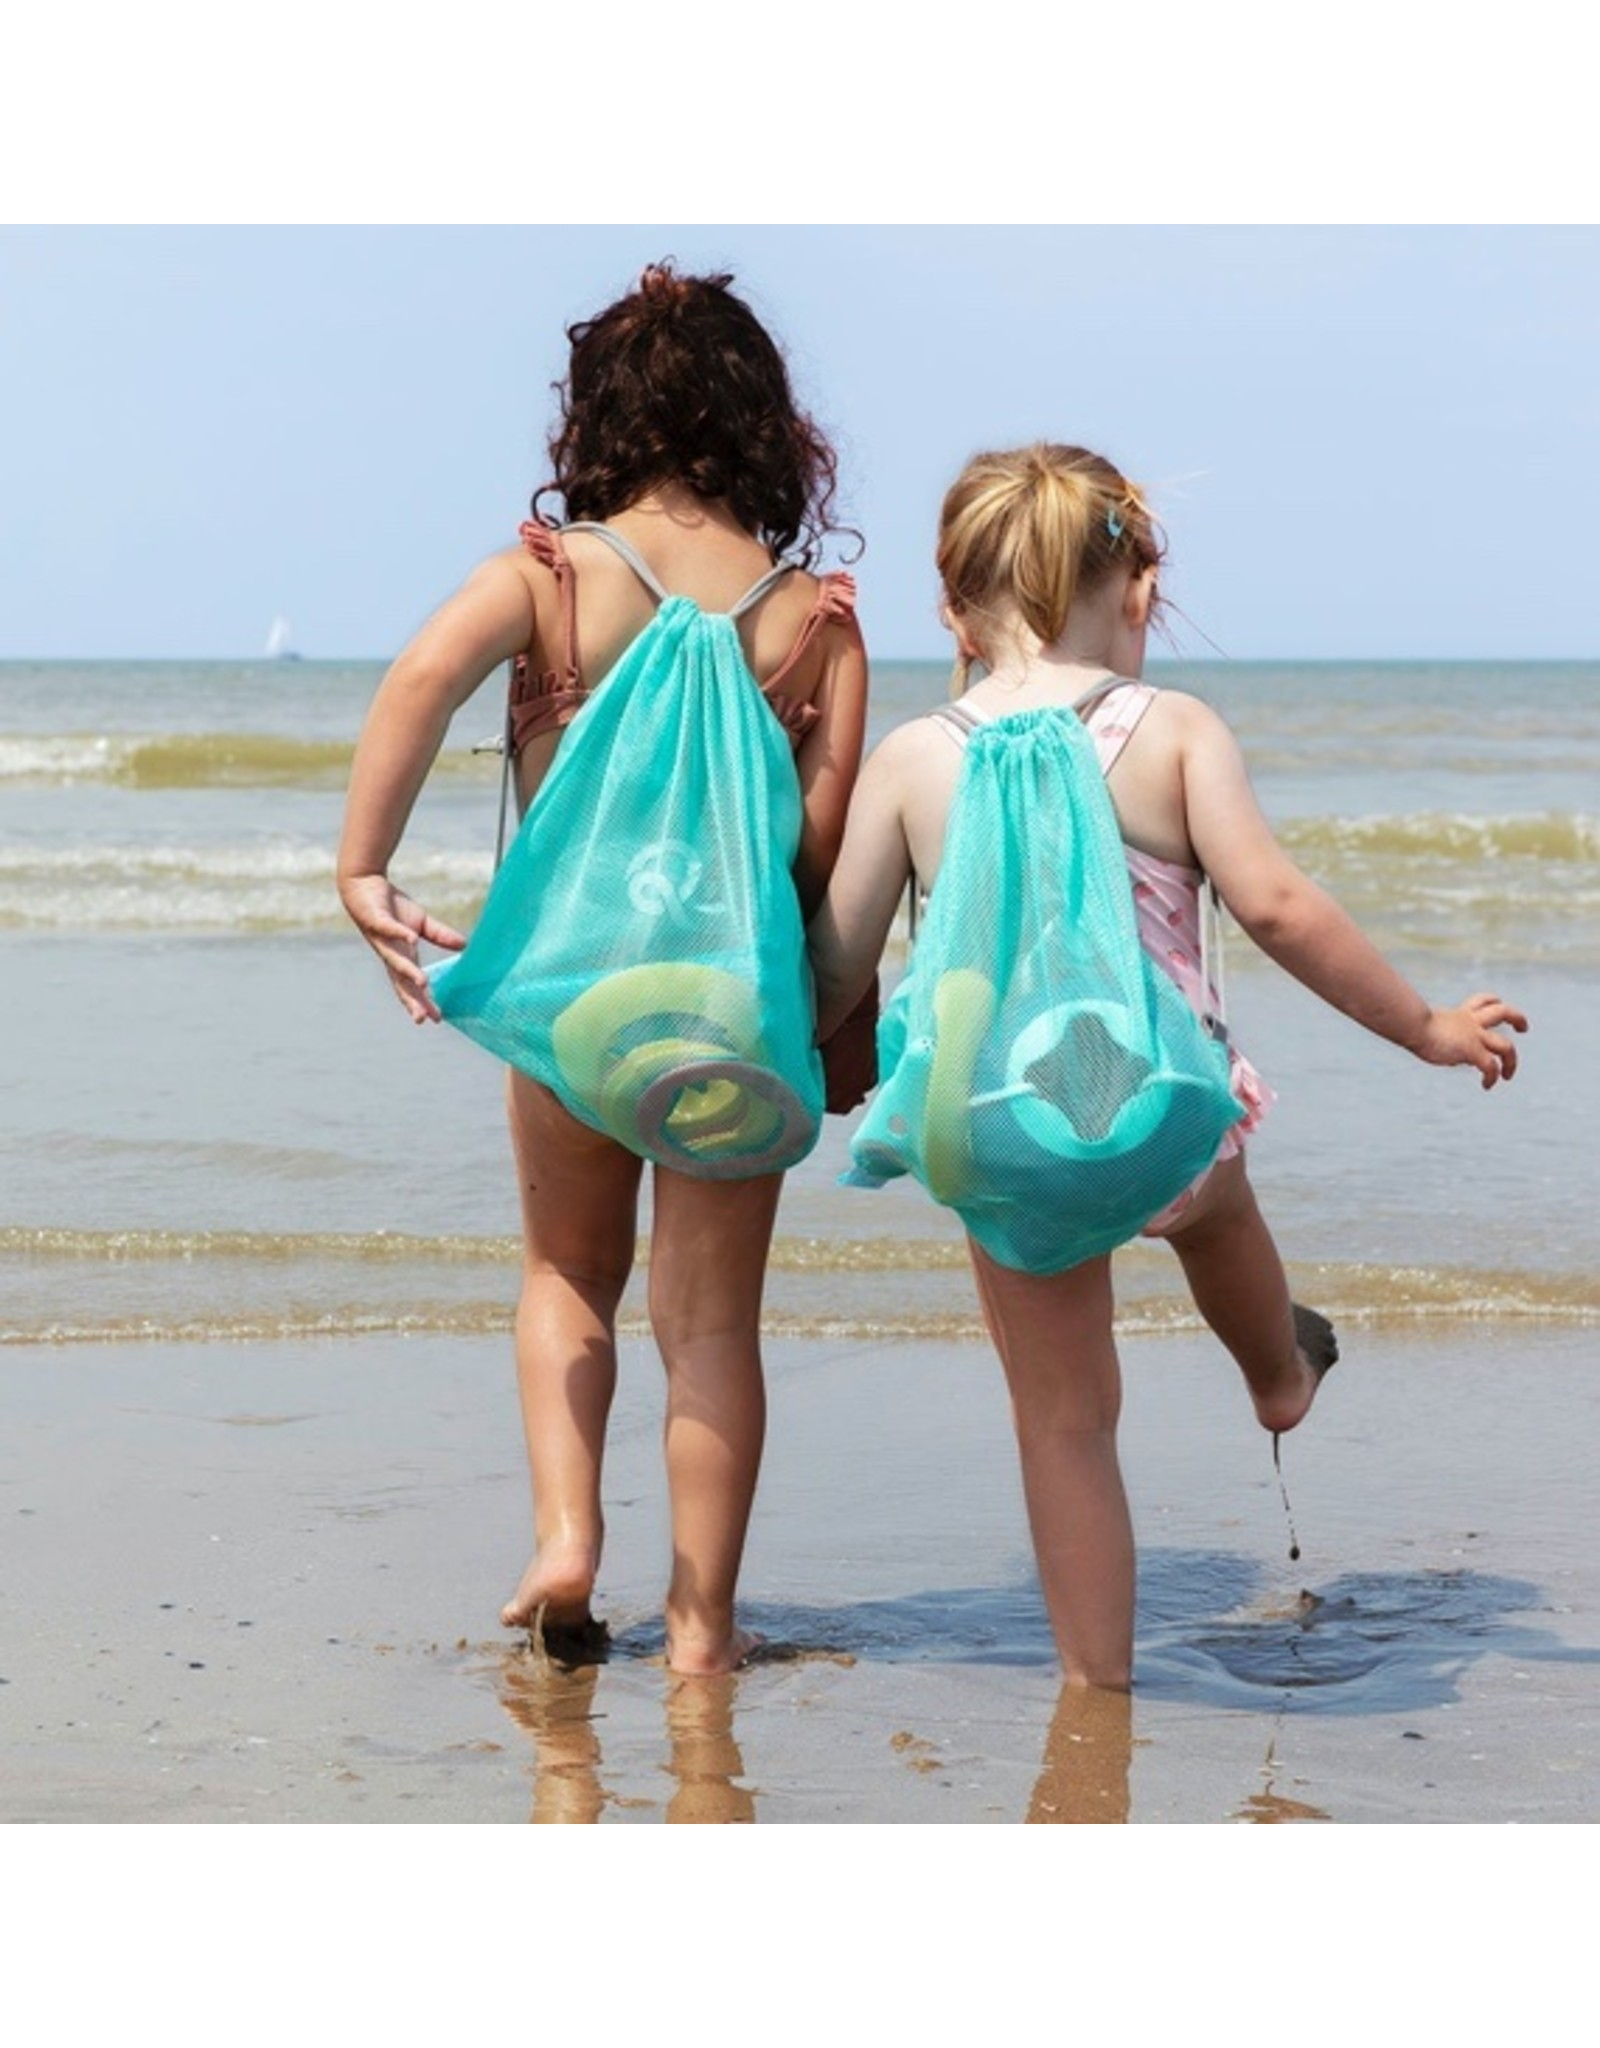 Quut Beach Set : 1 Triplet + 1 Ringo combi (6rings + 1 ball) + 1 mesh bag